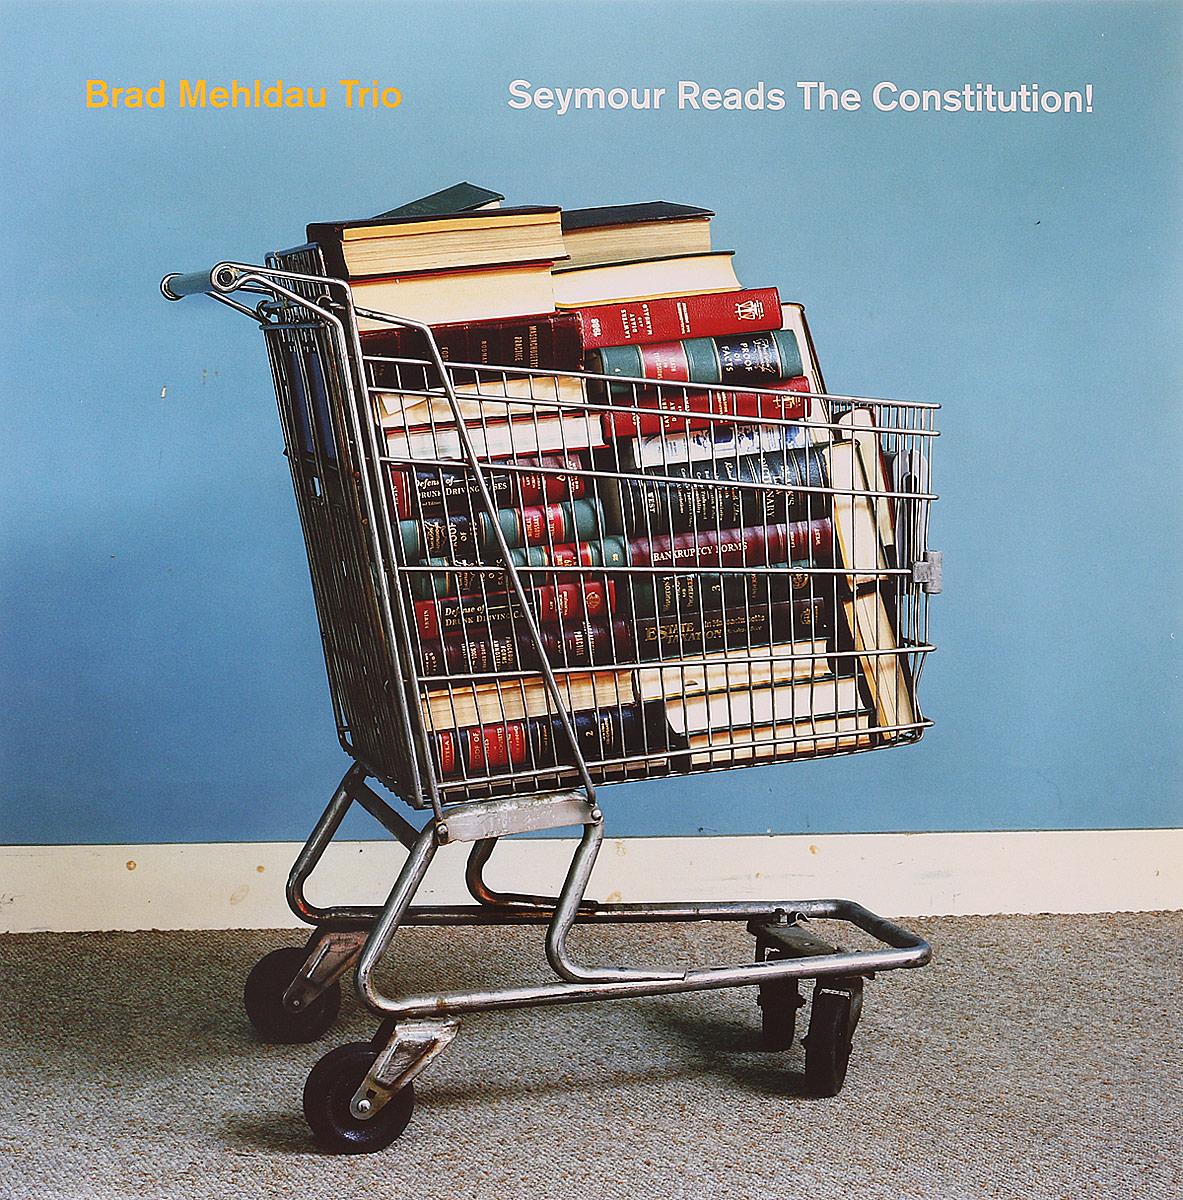 лучшая цена The Brad Mehldau Trio Brad Mehldau Trio. Seymour Reads The Constitution! (2 LP)